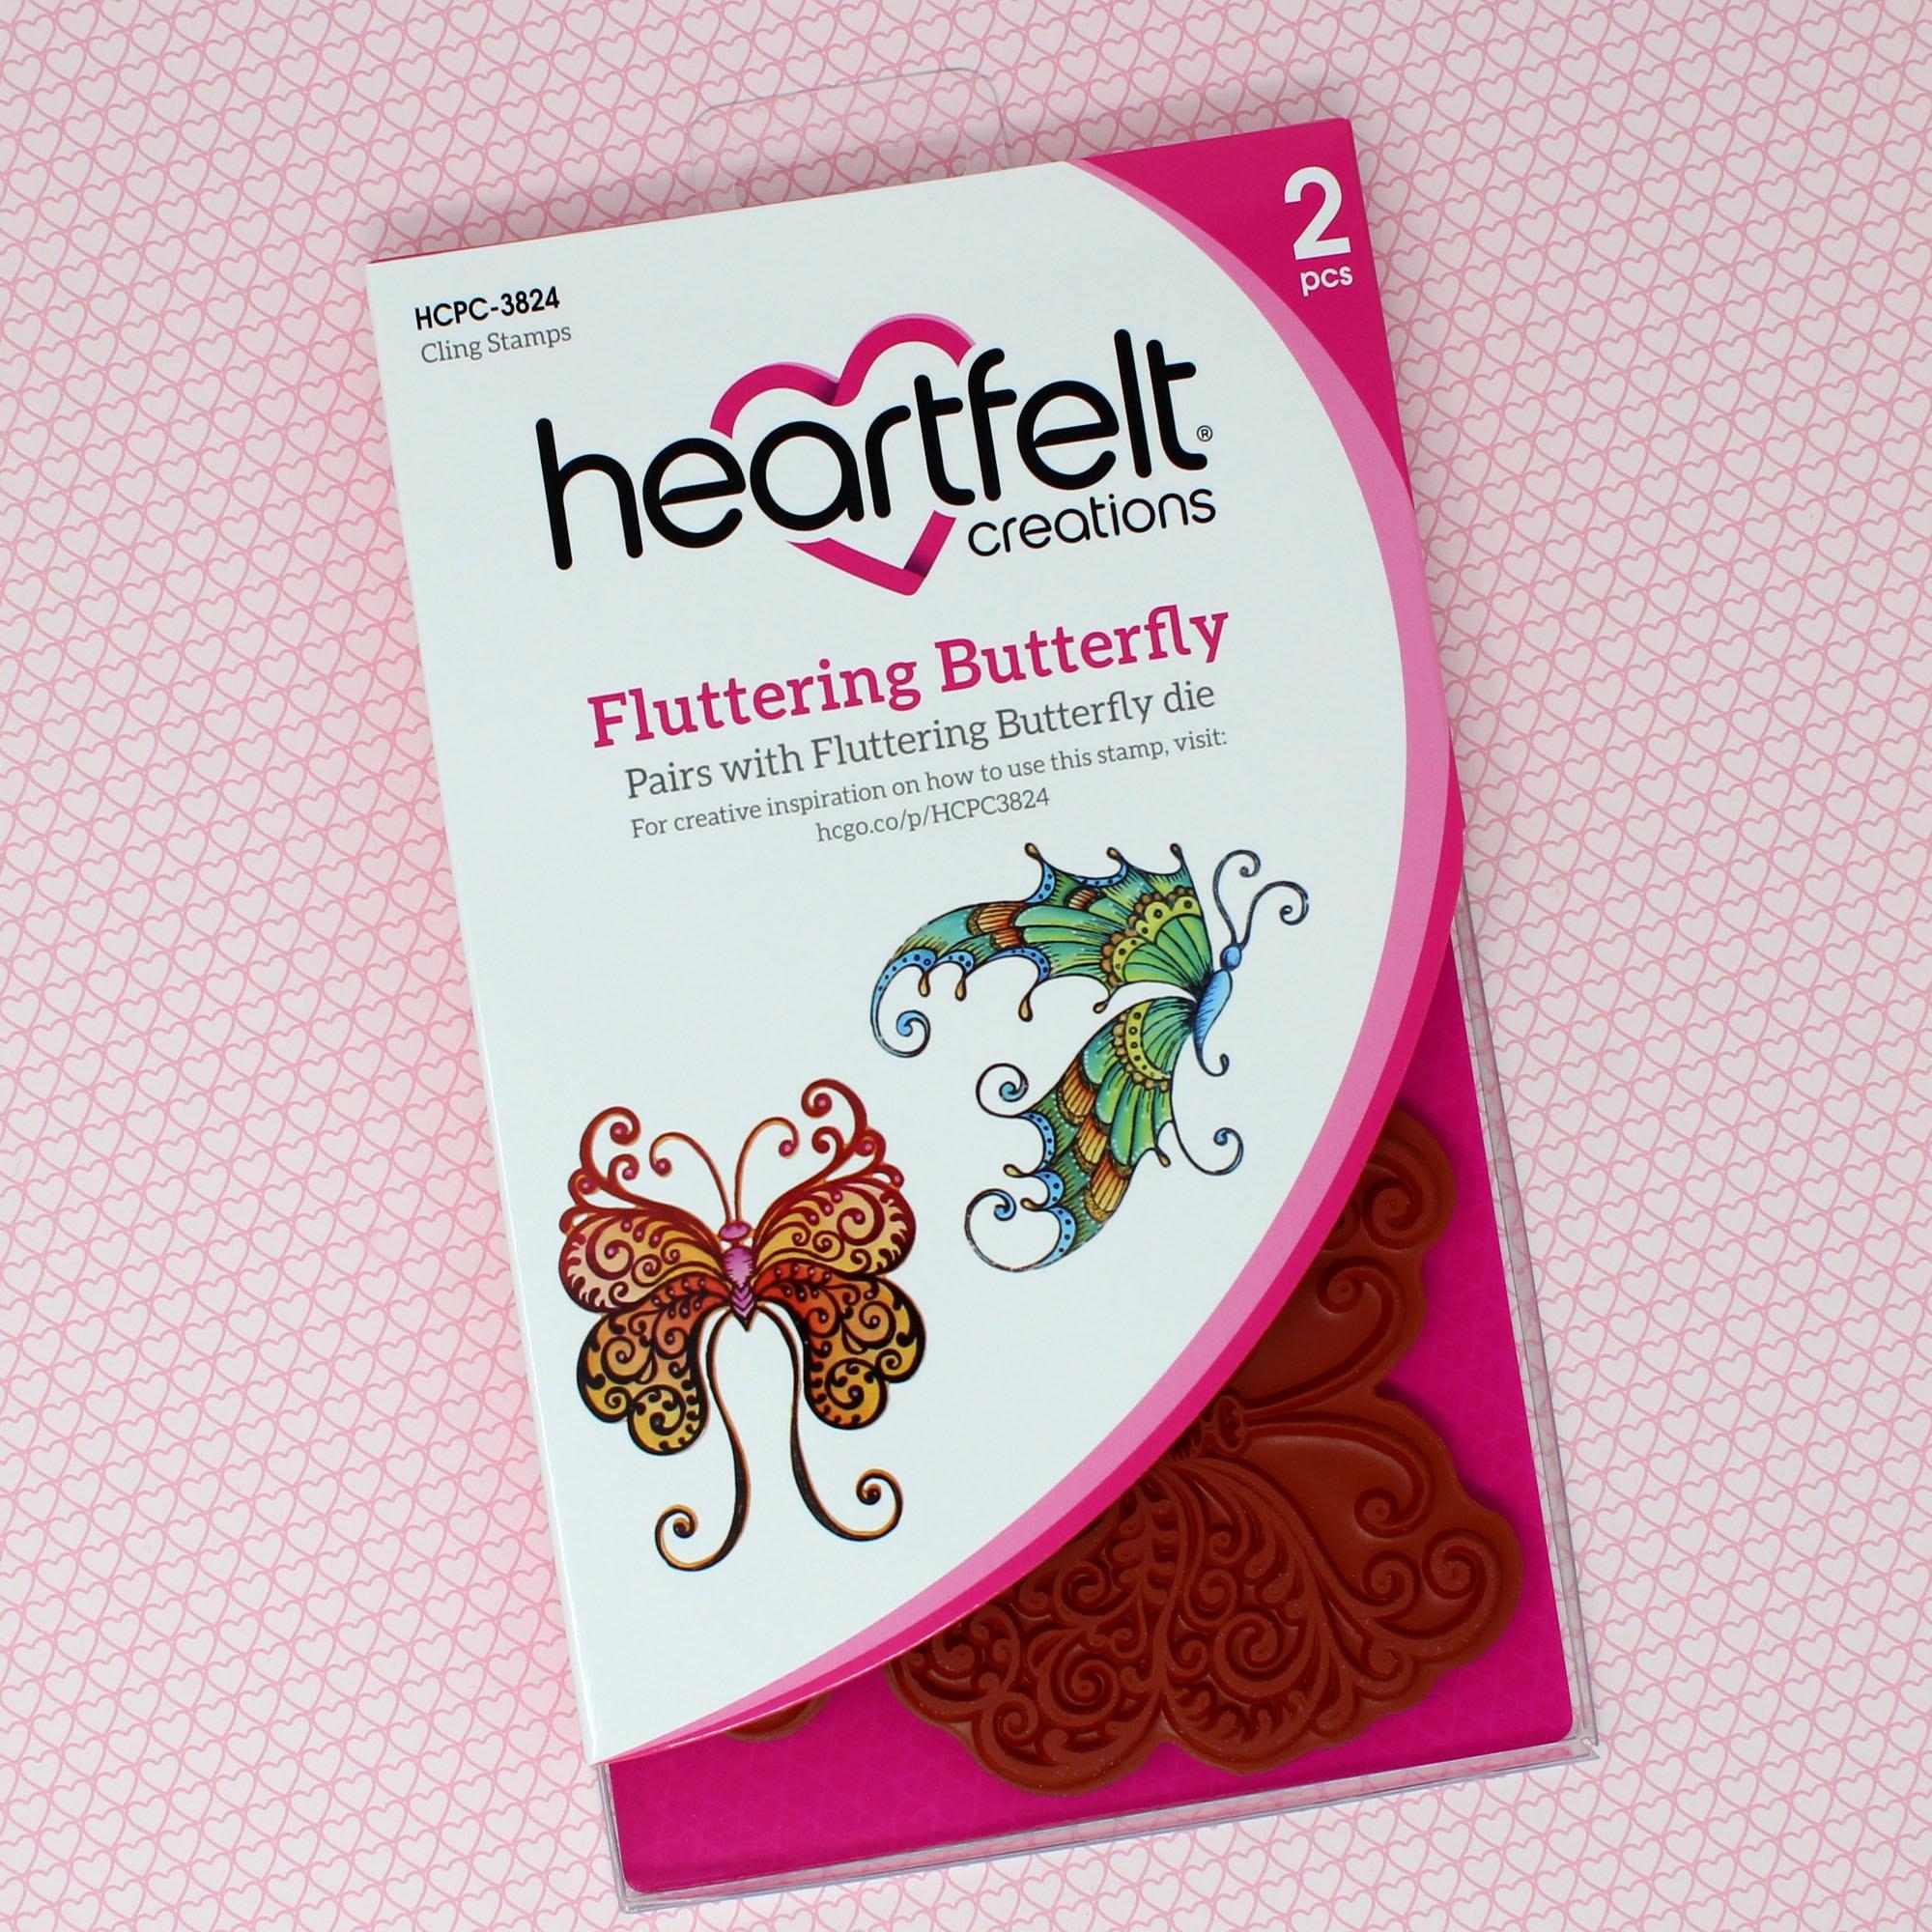 Fluttering Butterfly Cling Stamp Set